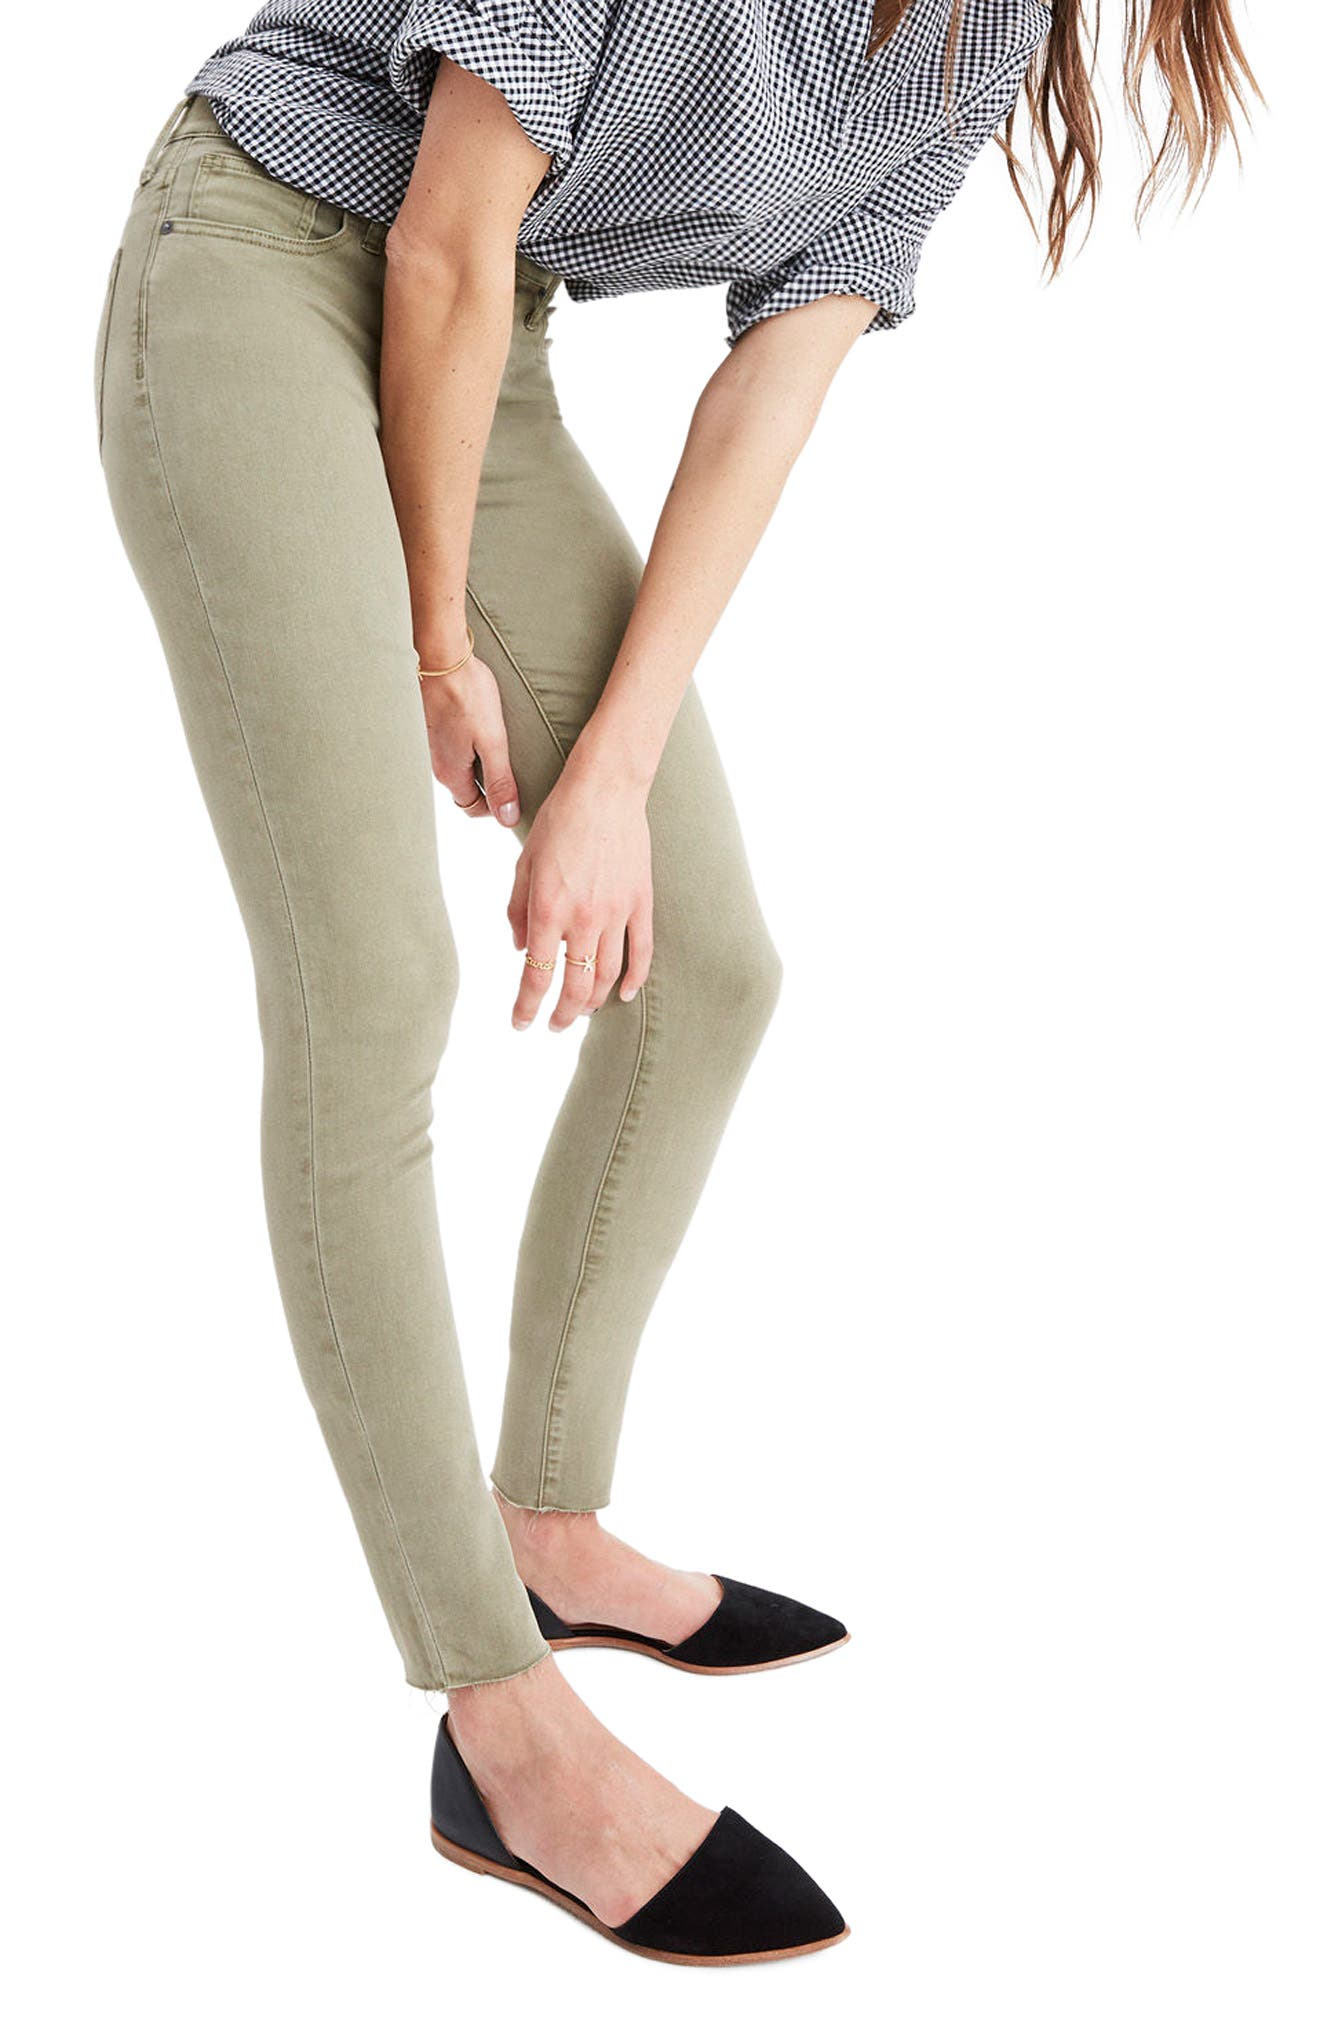 MADEWELL 9-Inch High-Rise Skinny Jeans: Raw-Hem Garment-Dyed Edition